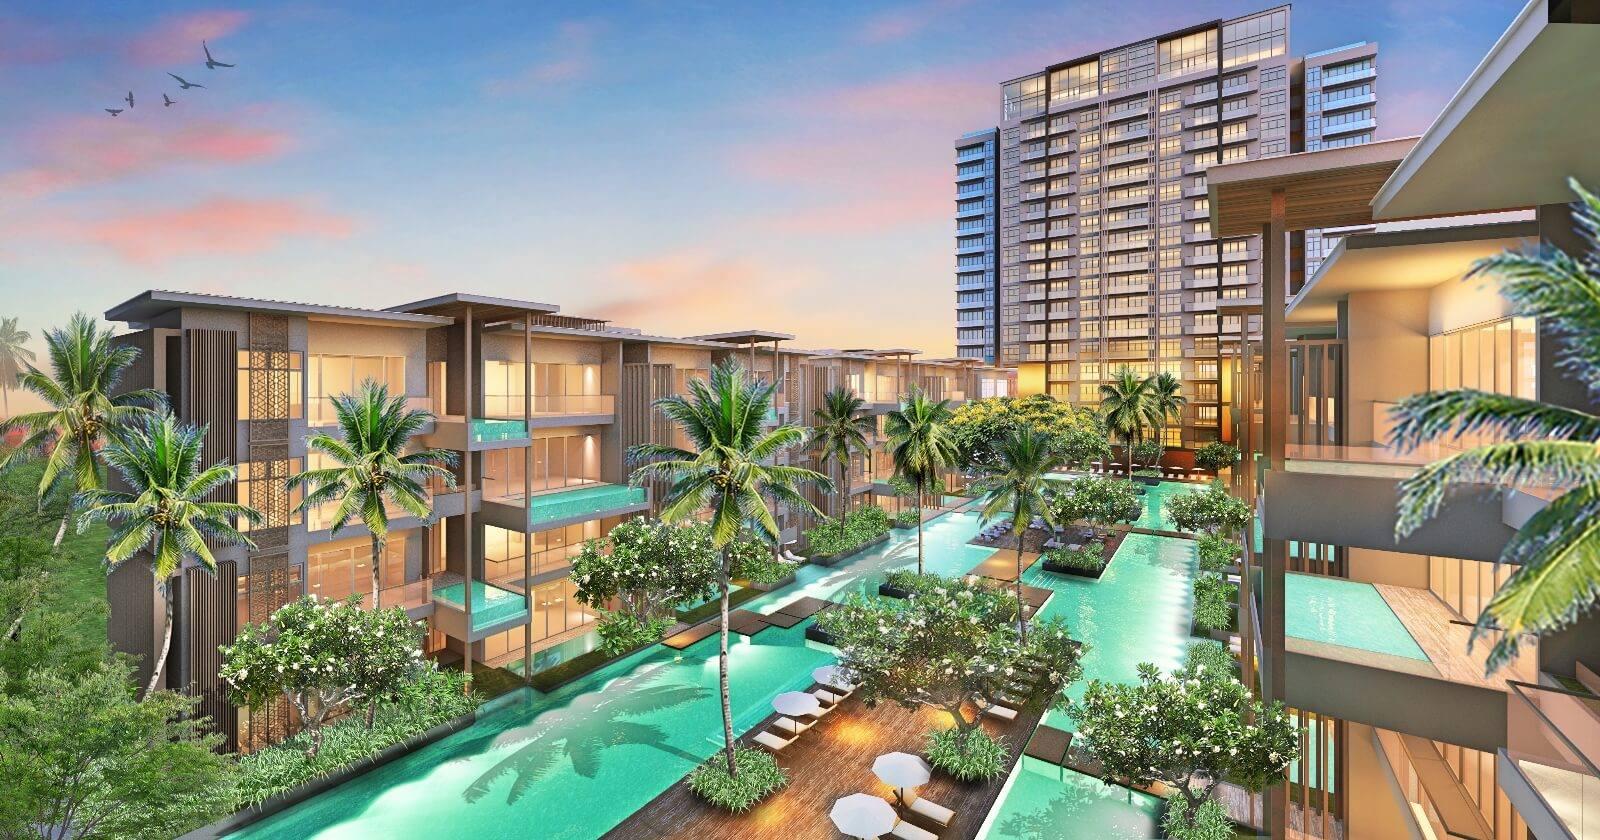 The Courtyard Villas at Sheraton Cebu Mactan Resort